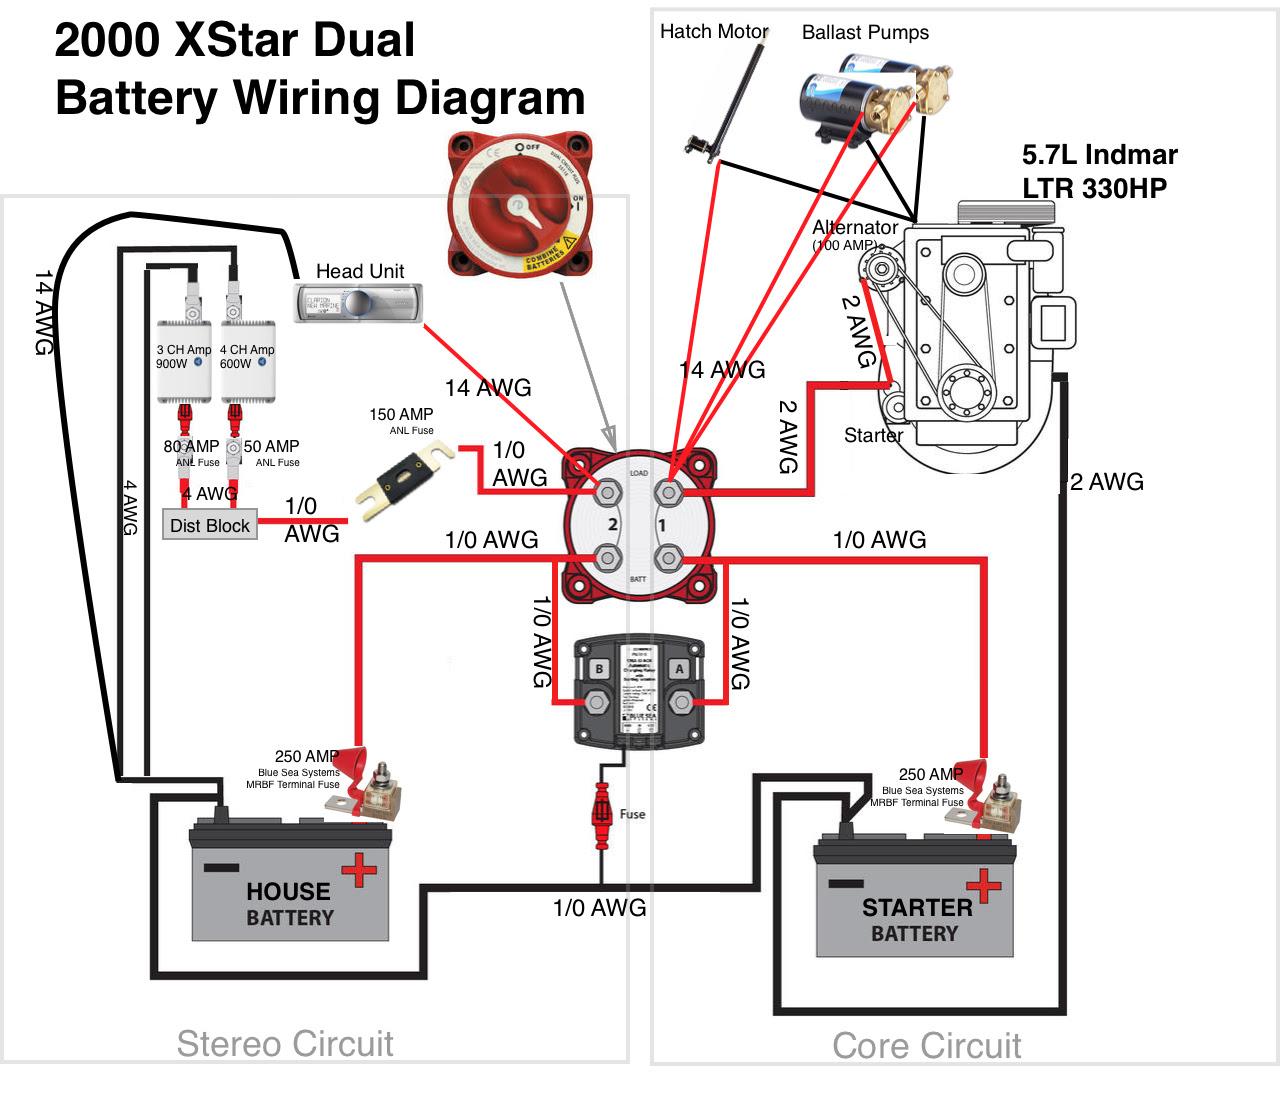 Diagram Wii U Battery Wiring Diagram Full Version Hd Quality Wiring Diagram Blogxgoo Mefpie Fr